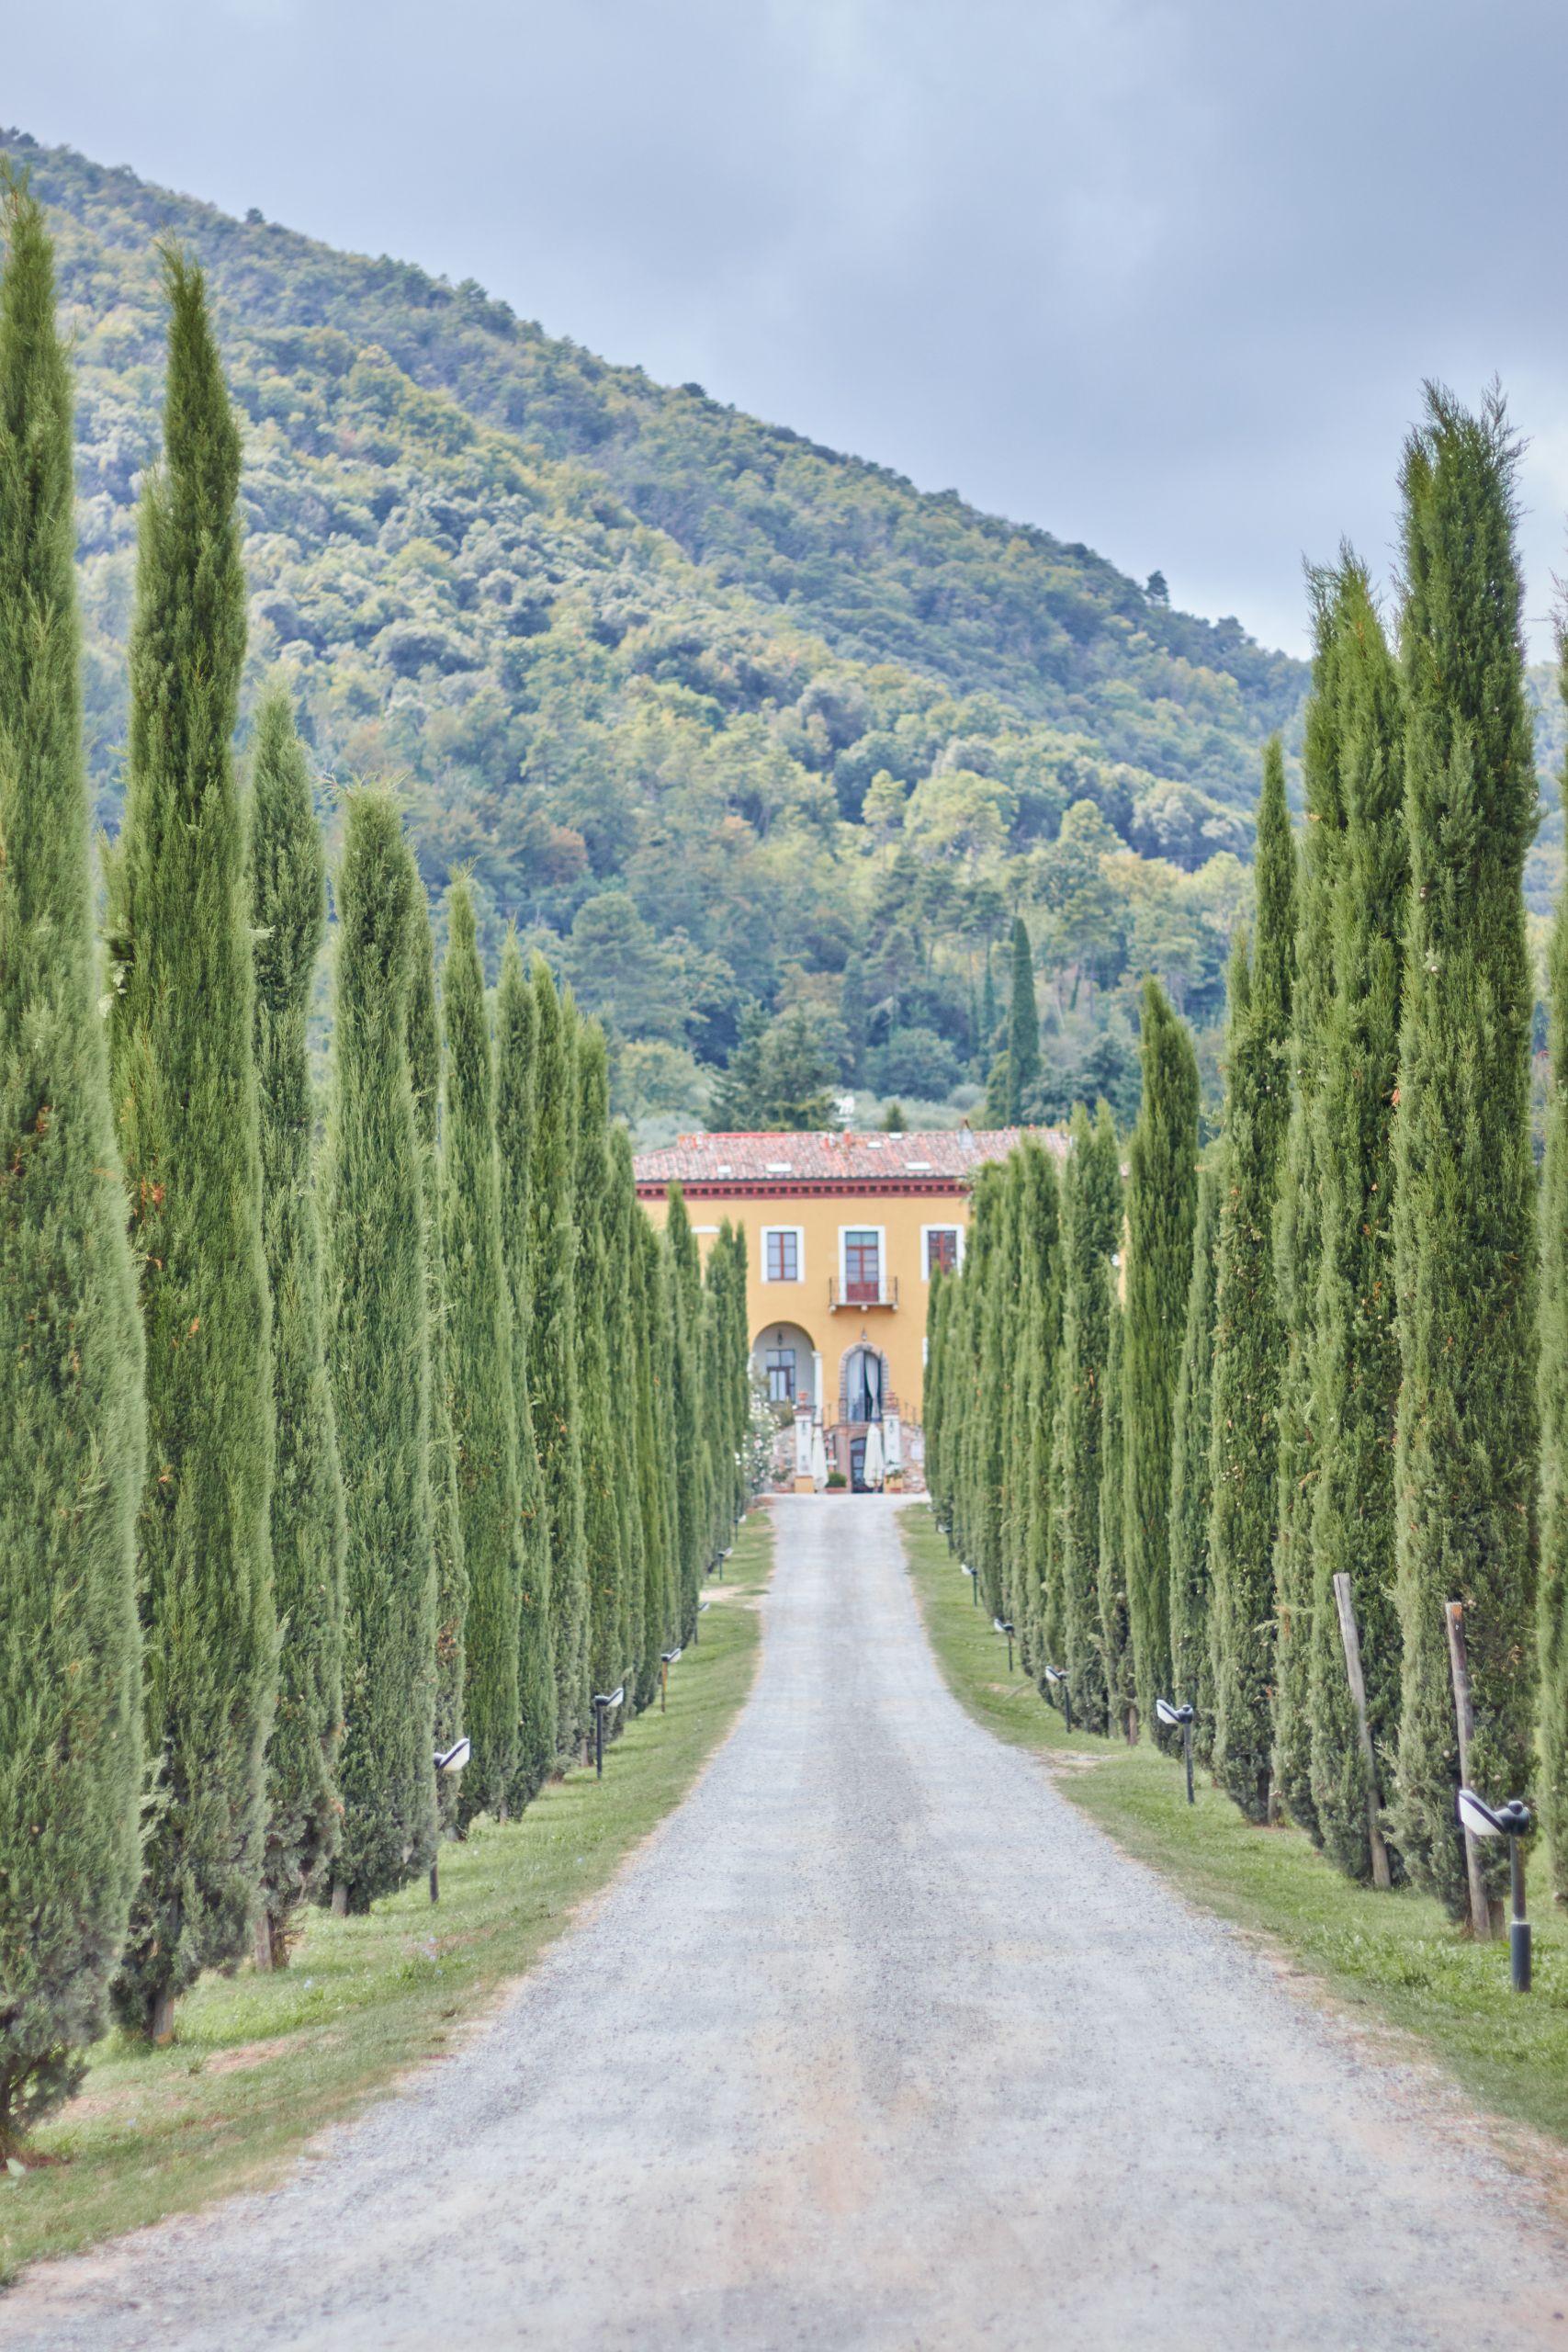 Villa Cheli Lucca als Stopp vom Toskana Roadtrip